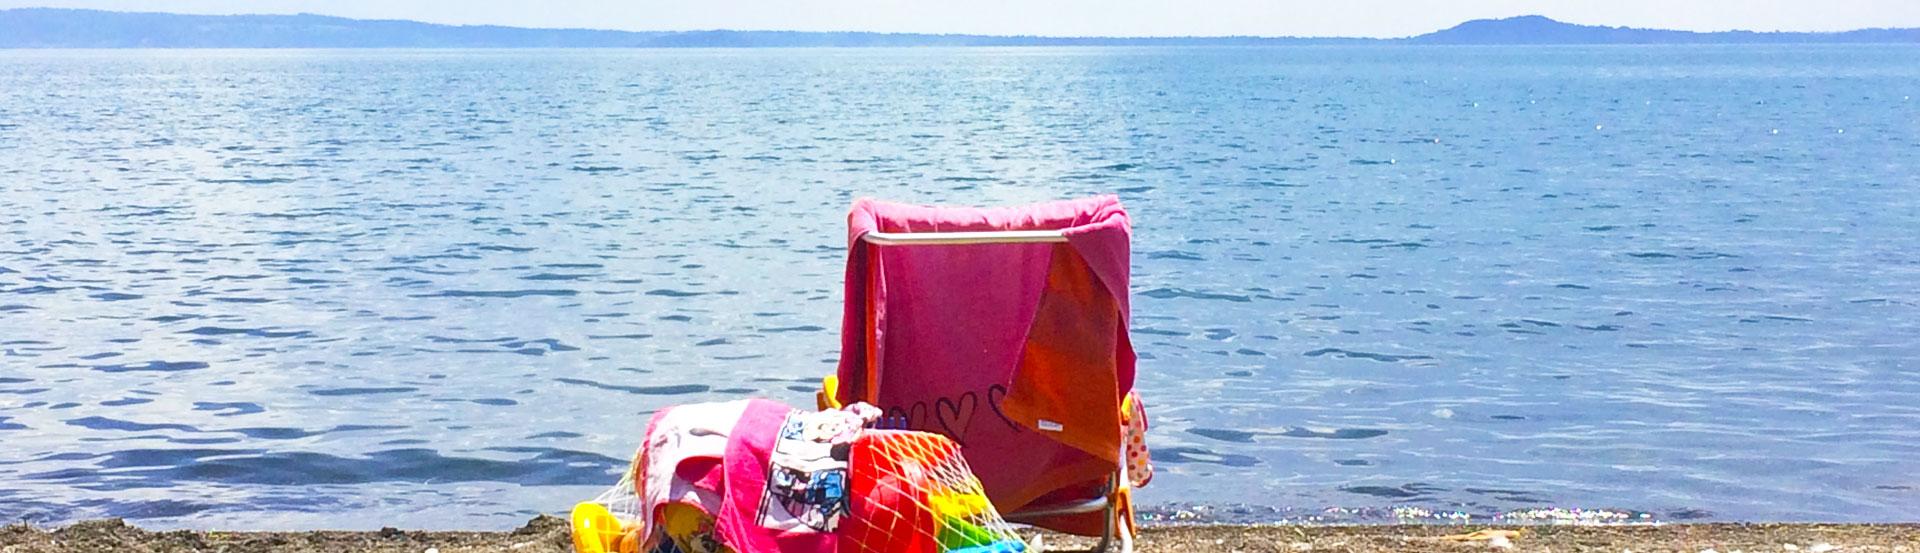 camping-valdisole-bolsena-lake-1920-553-03